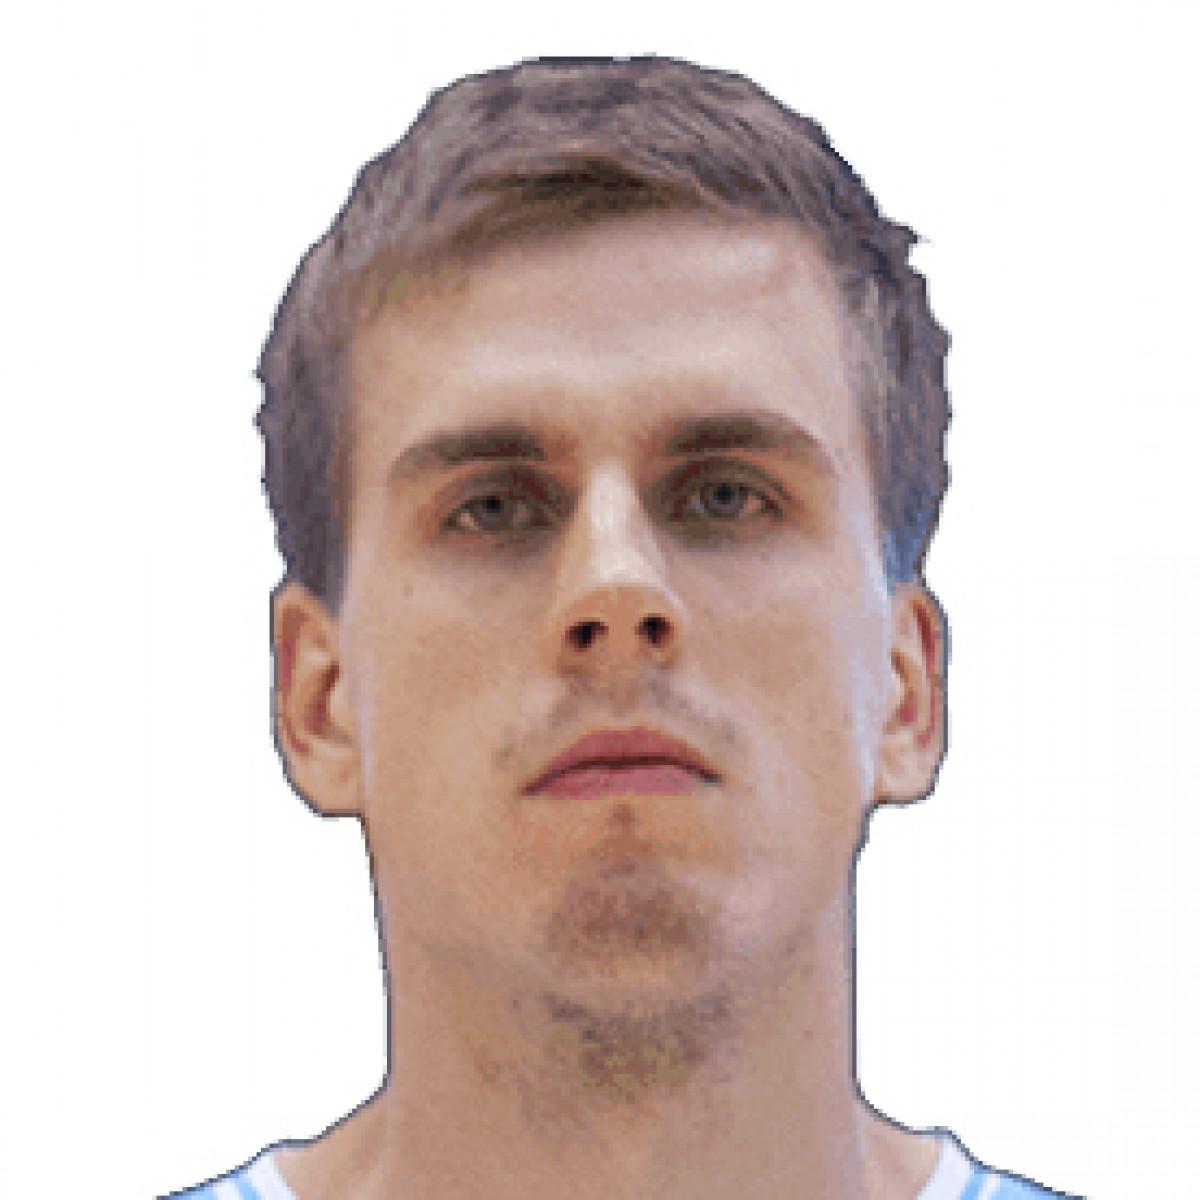 Volodymyr Gerun